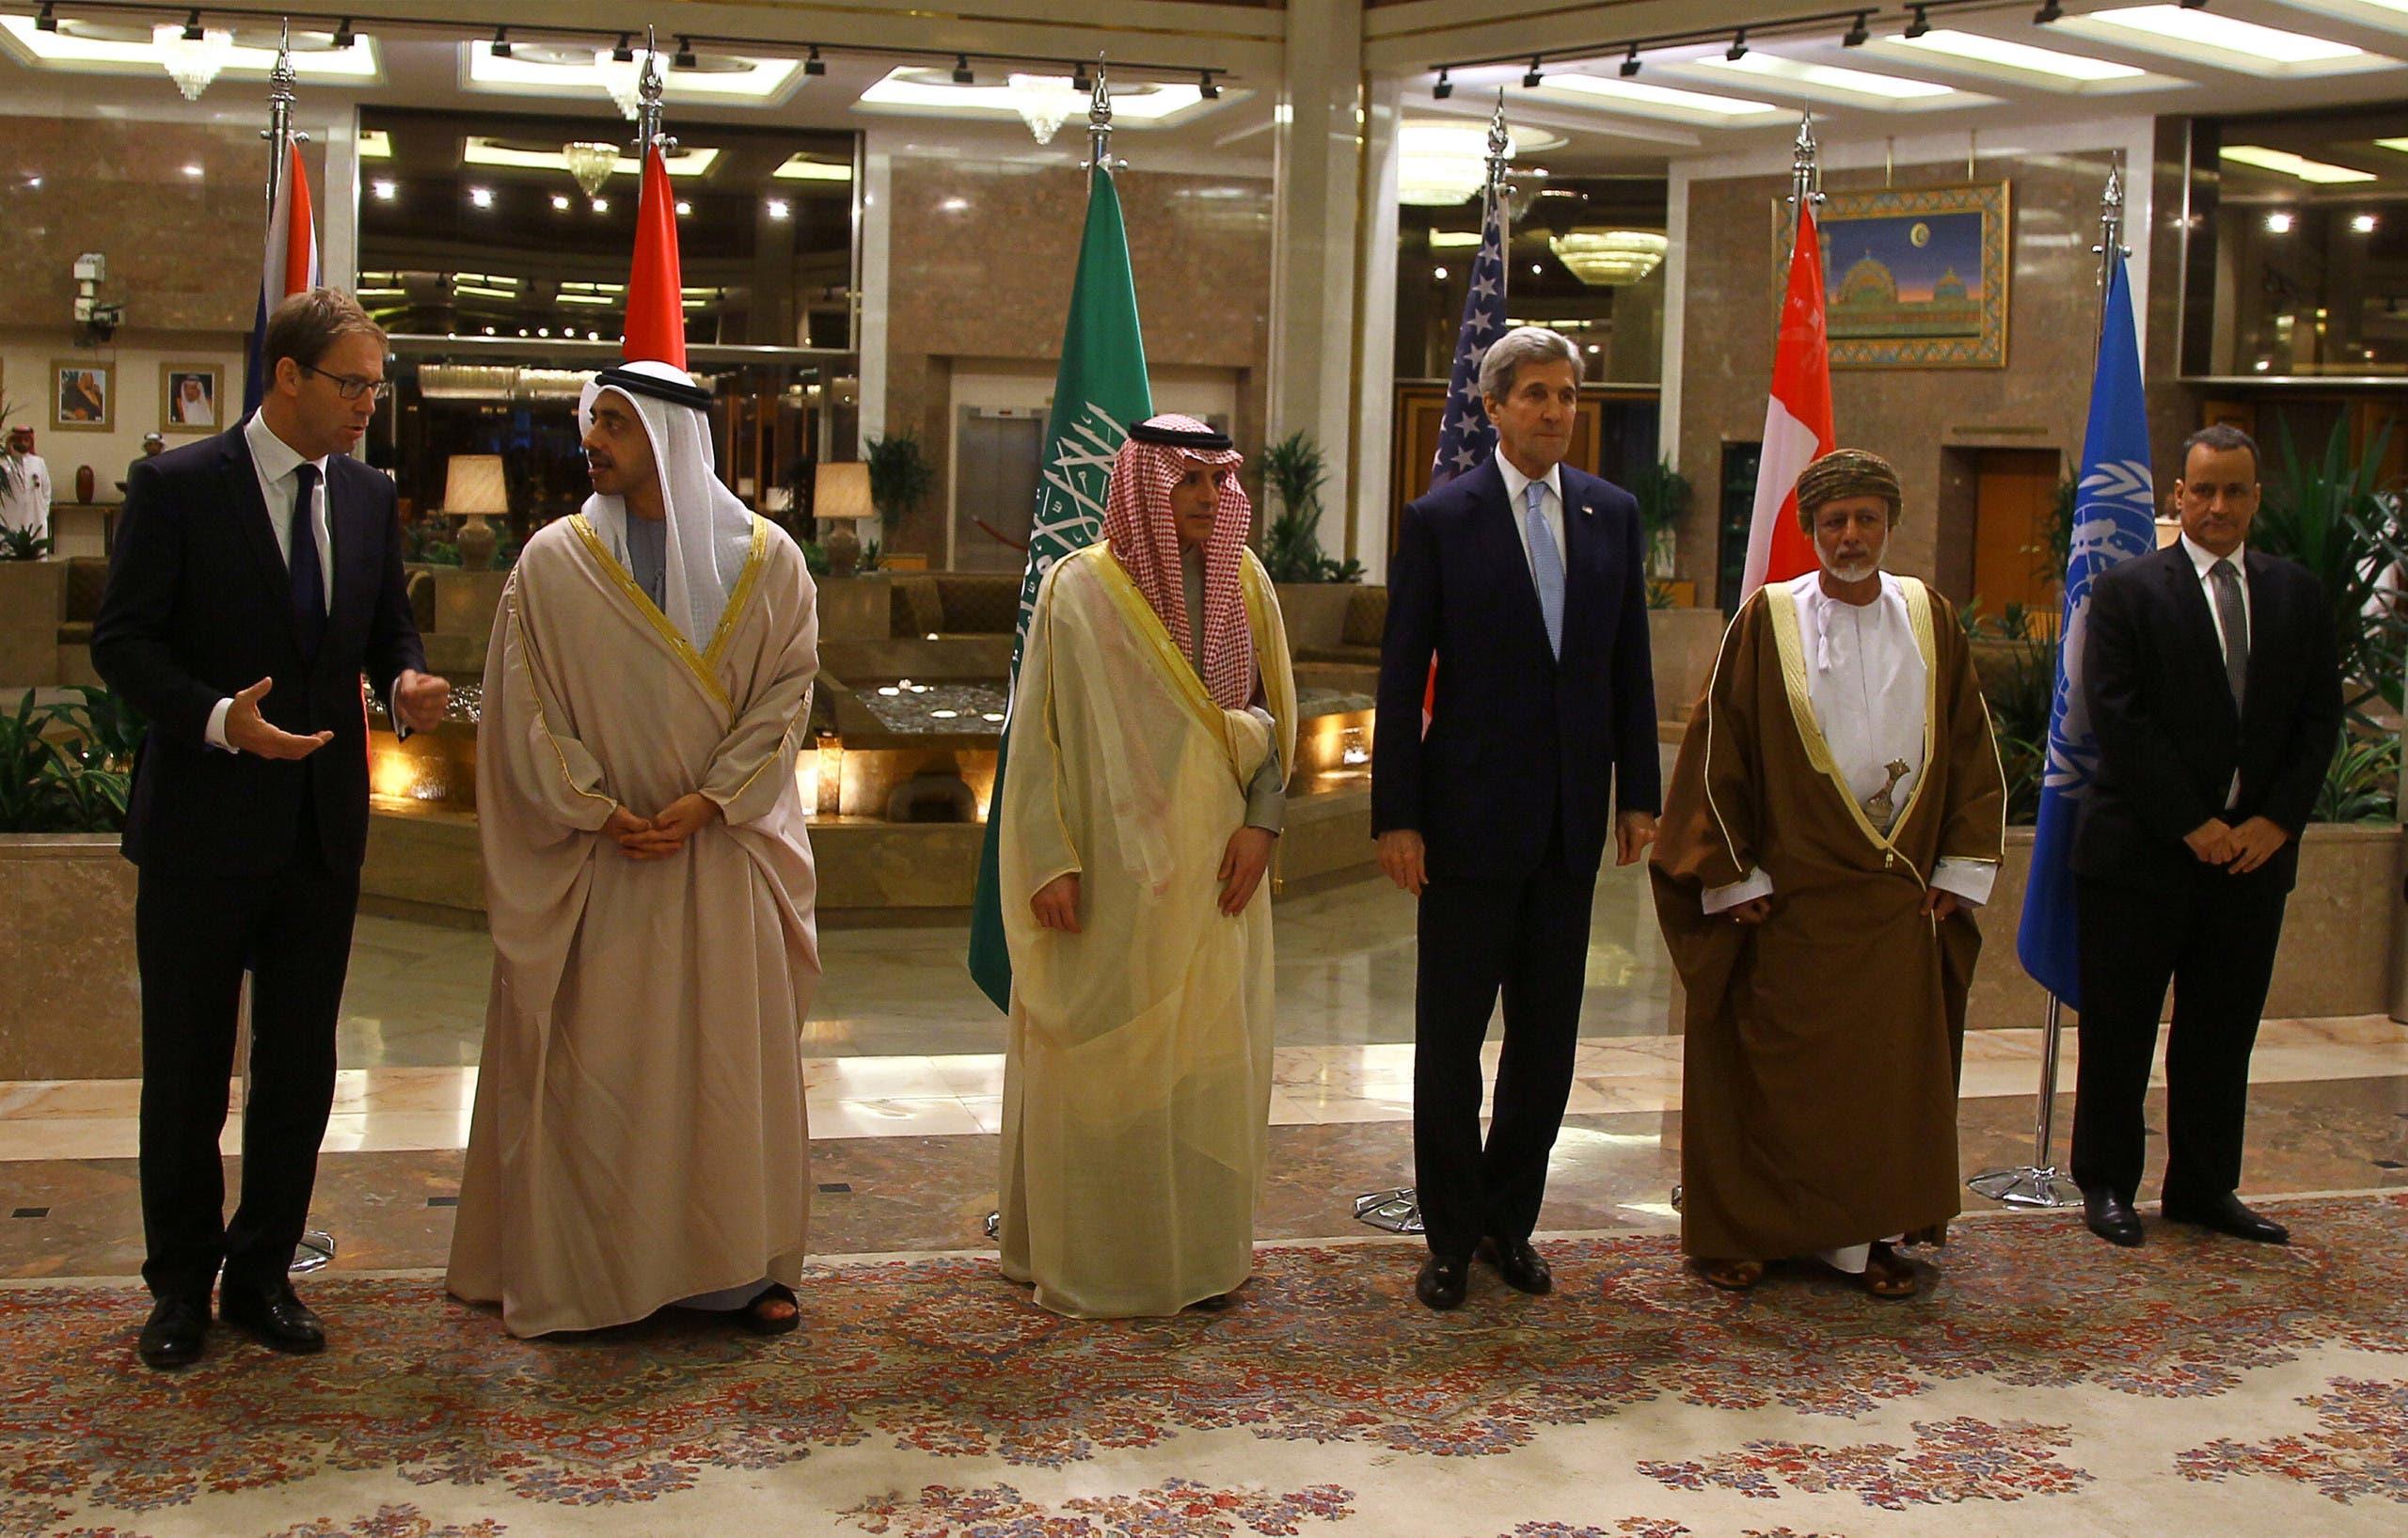 (L-R) Britain's MP Tobias Ellwood, Emirati Foreign Minister Sheikh Abdullah bin Zayed al-Nahyan, Saudi Arabia's Foreign Minister Adel al-Jubeir, U.S. Secretary of State John Kerry, Oman's Foreign Minister Yusuf bin Alawi bin Abdullah, and U.N. special envoy to Yemen Ismail Ould Cheikh Ahmed pose for a group photo in Riyadh, Saudi Arabia December 18, 2016. REUTERS/Faisal Al Nasser